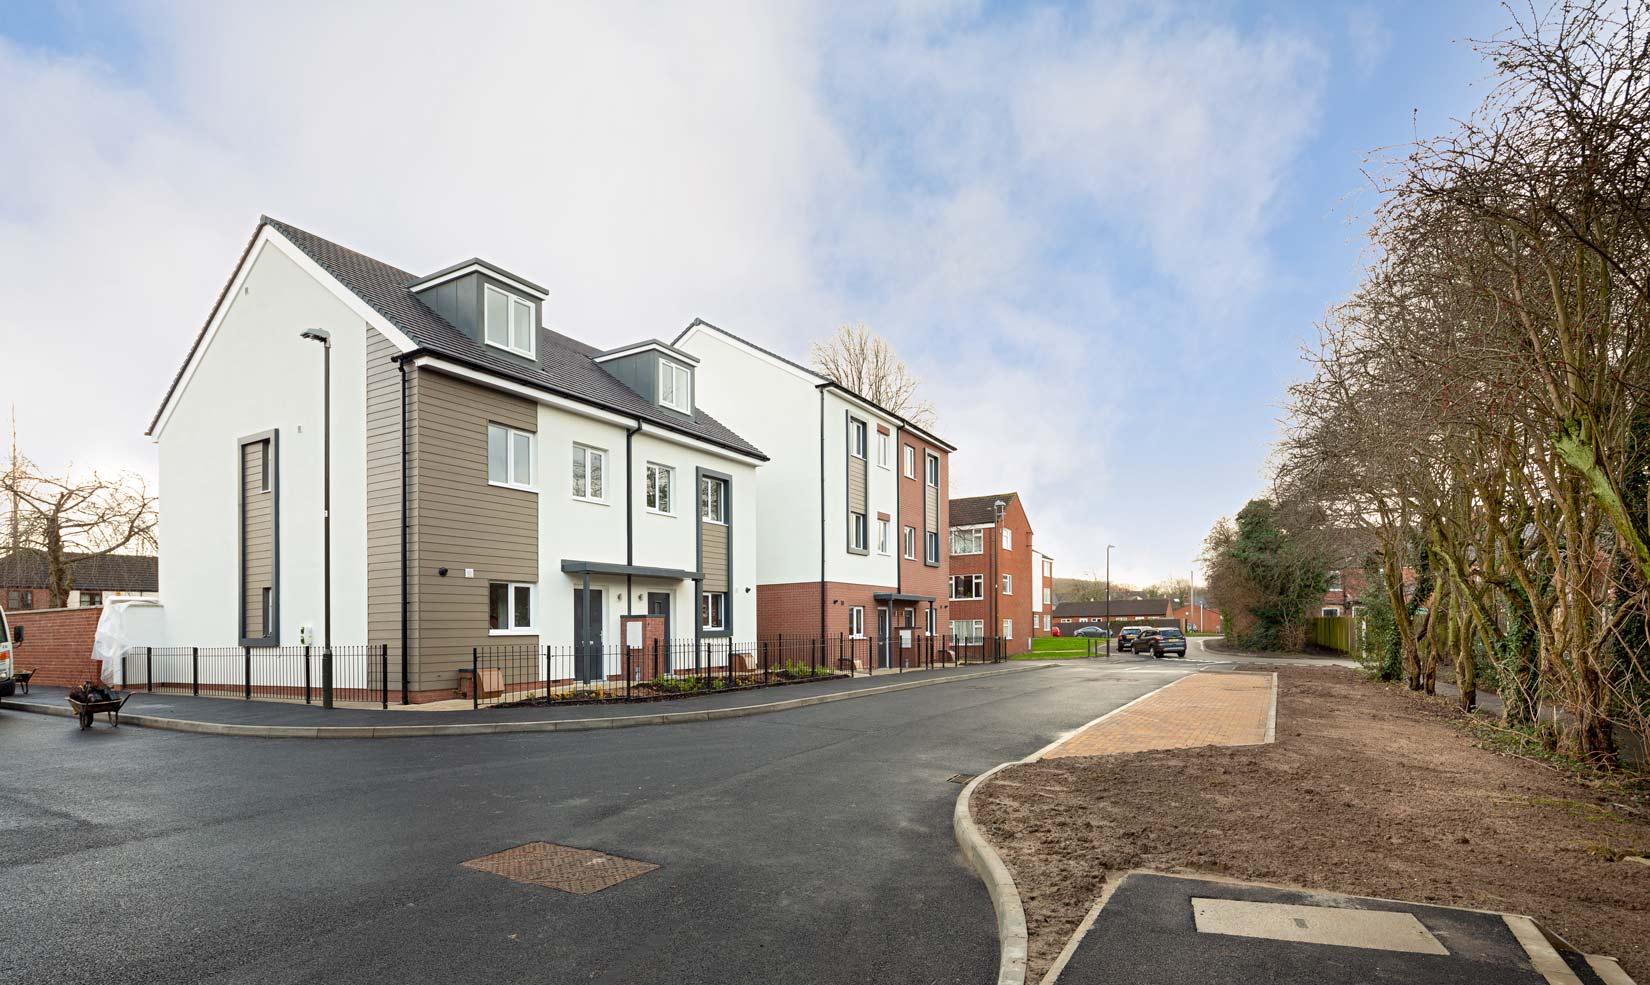 new-housing-development-Chesterfield